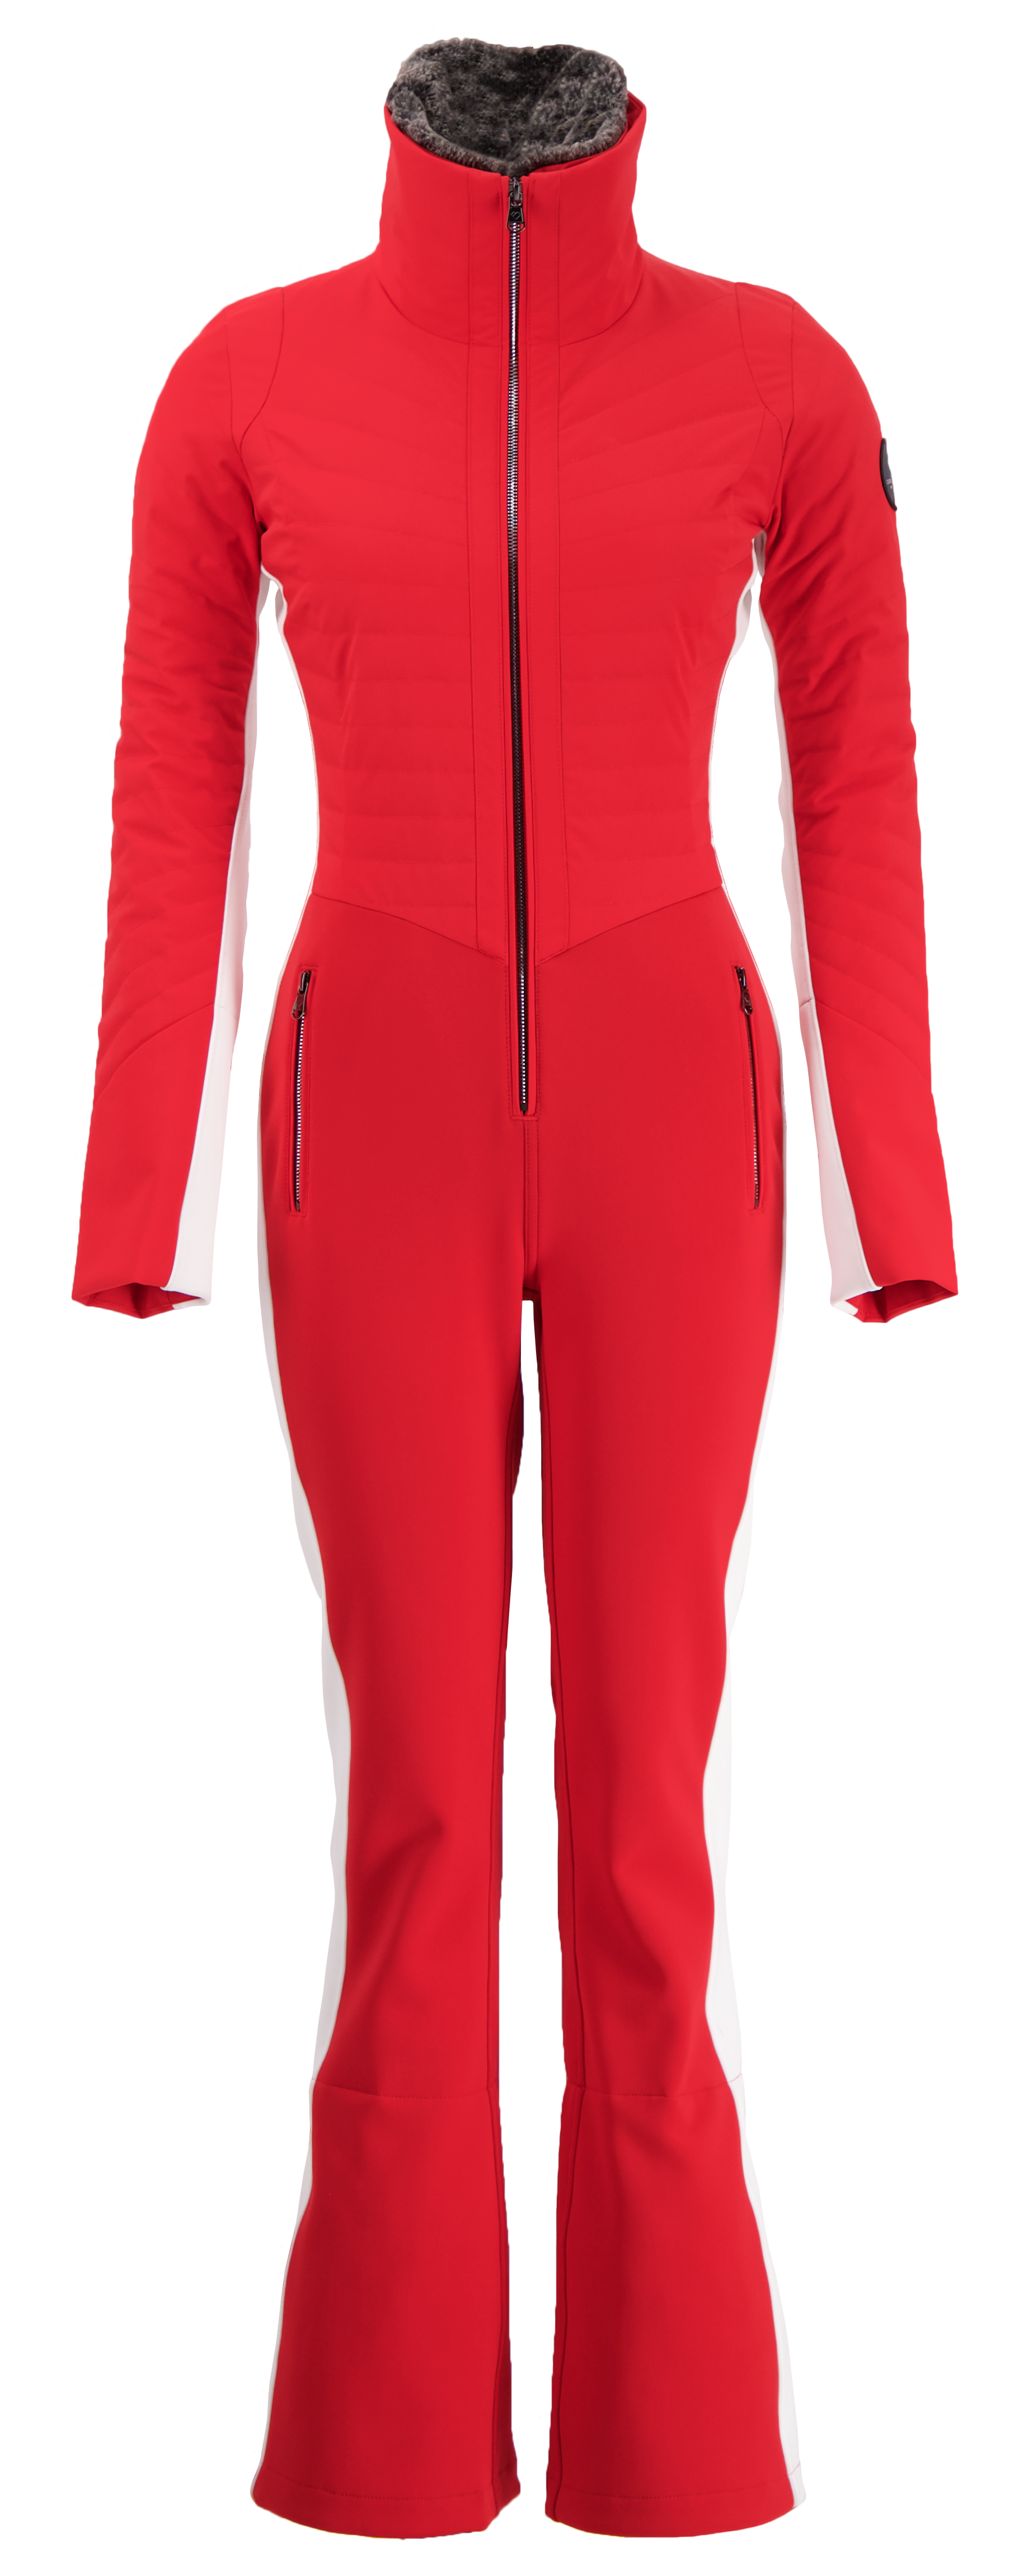 après-ski clothes.5